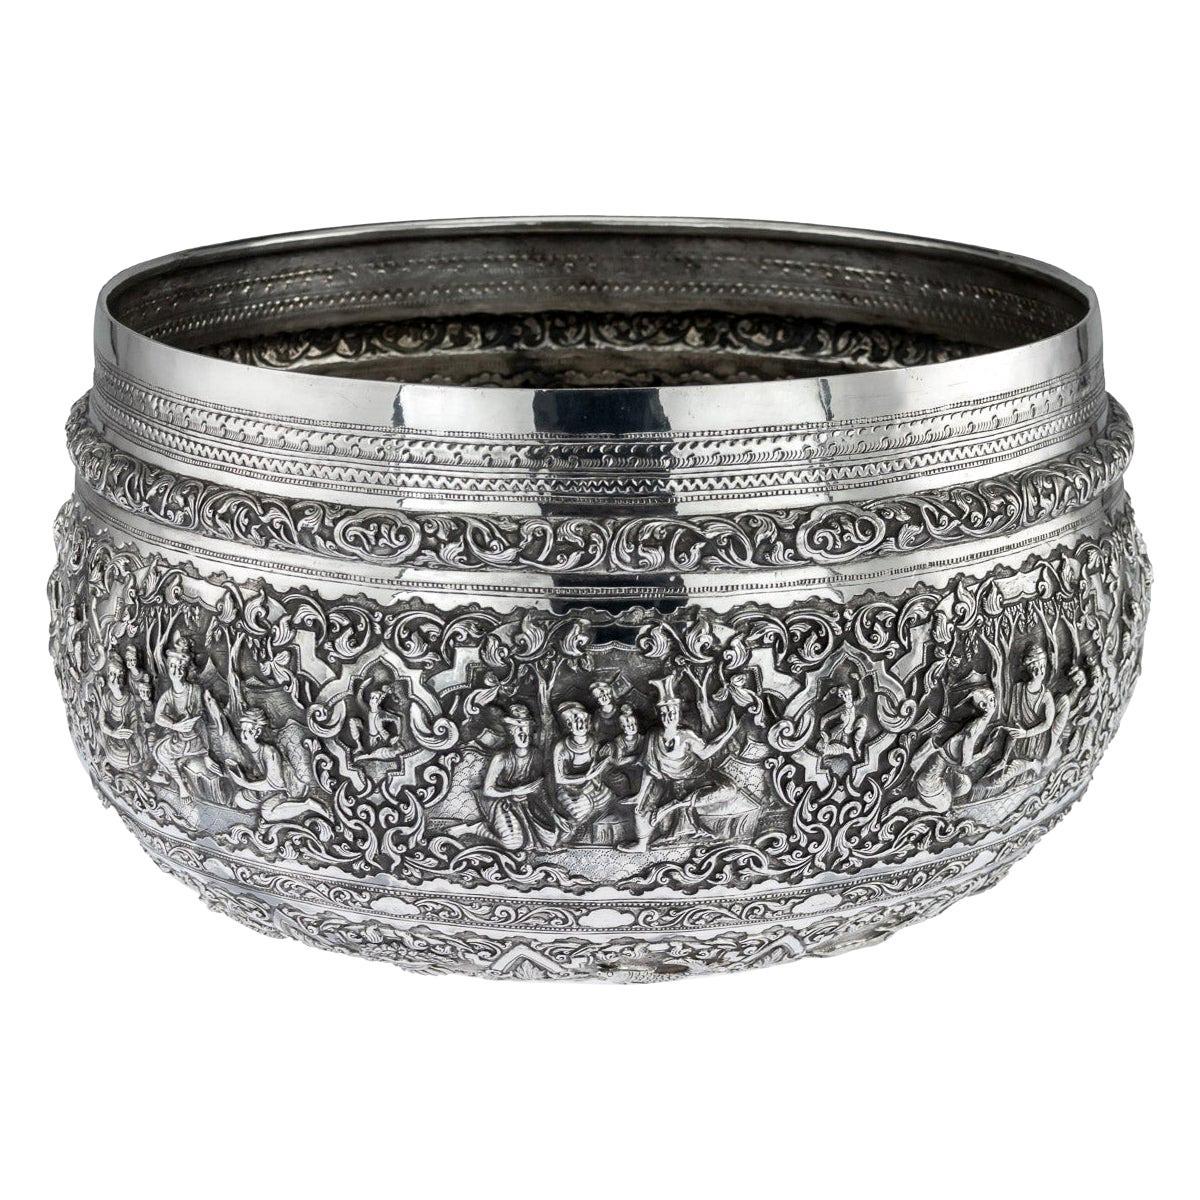 Antique Monumental Burmese Solid Silver Thabeik Bowl, Rangoon, circa 1900